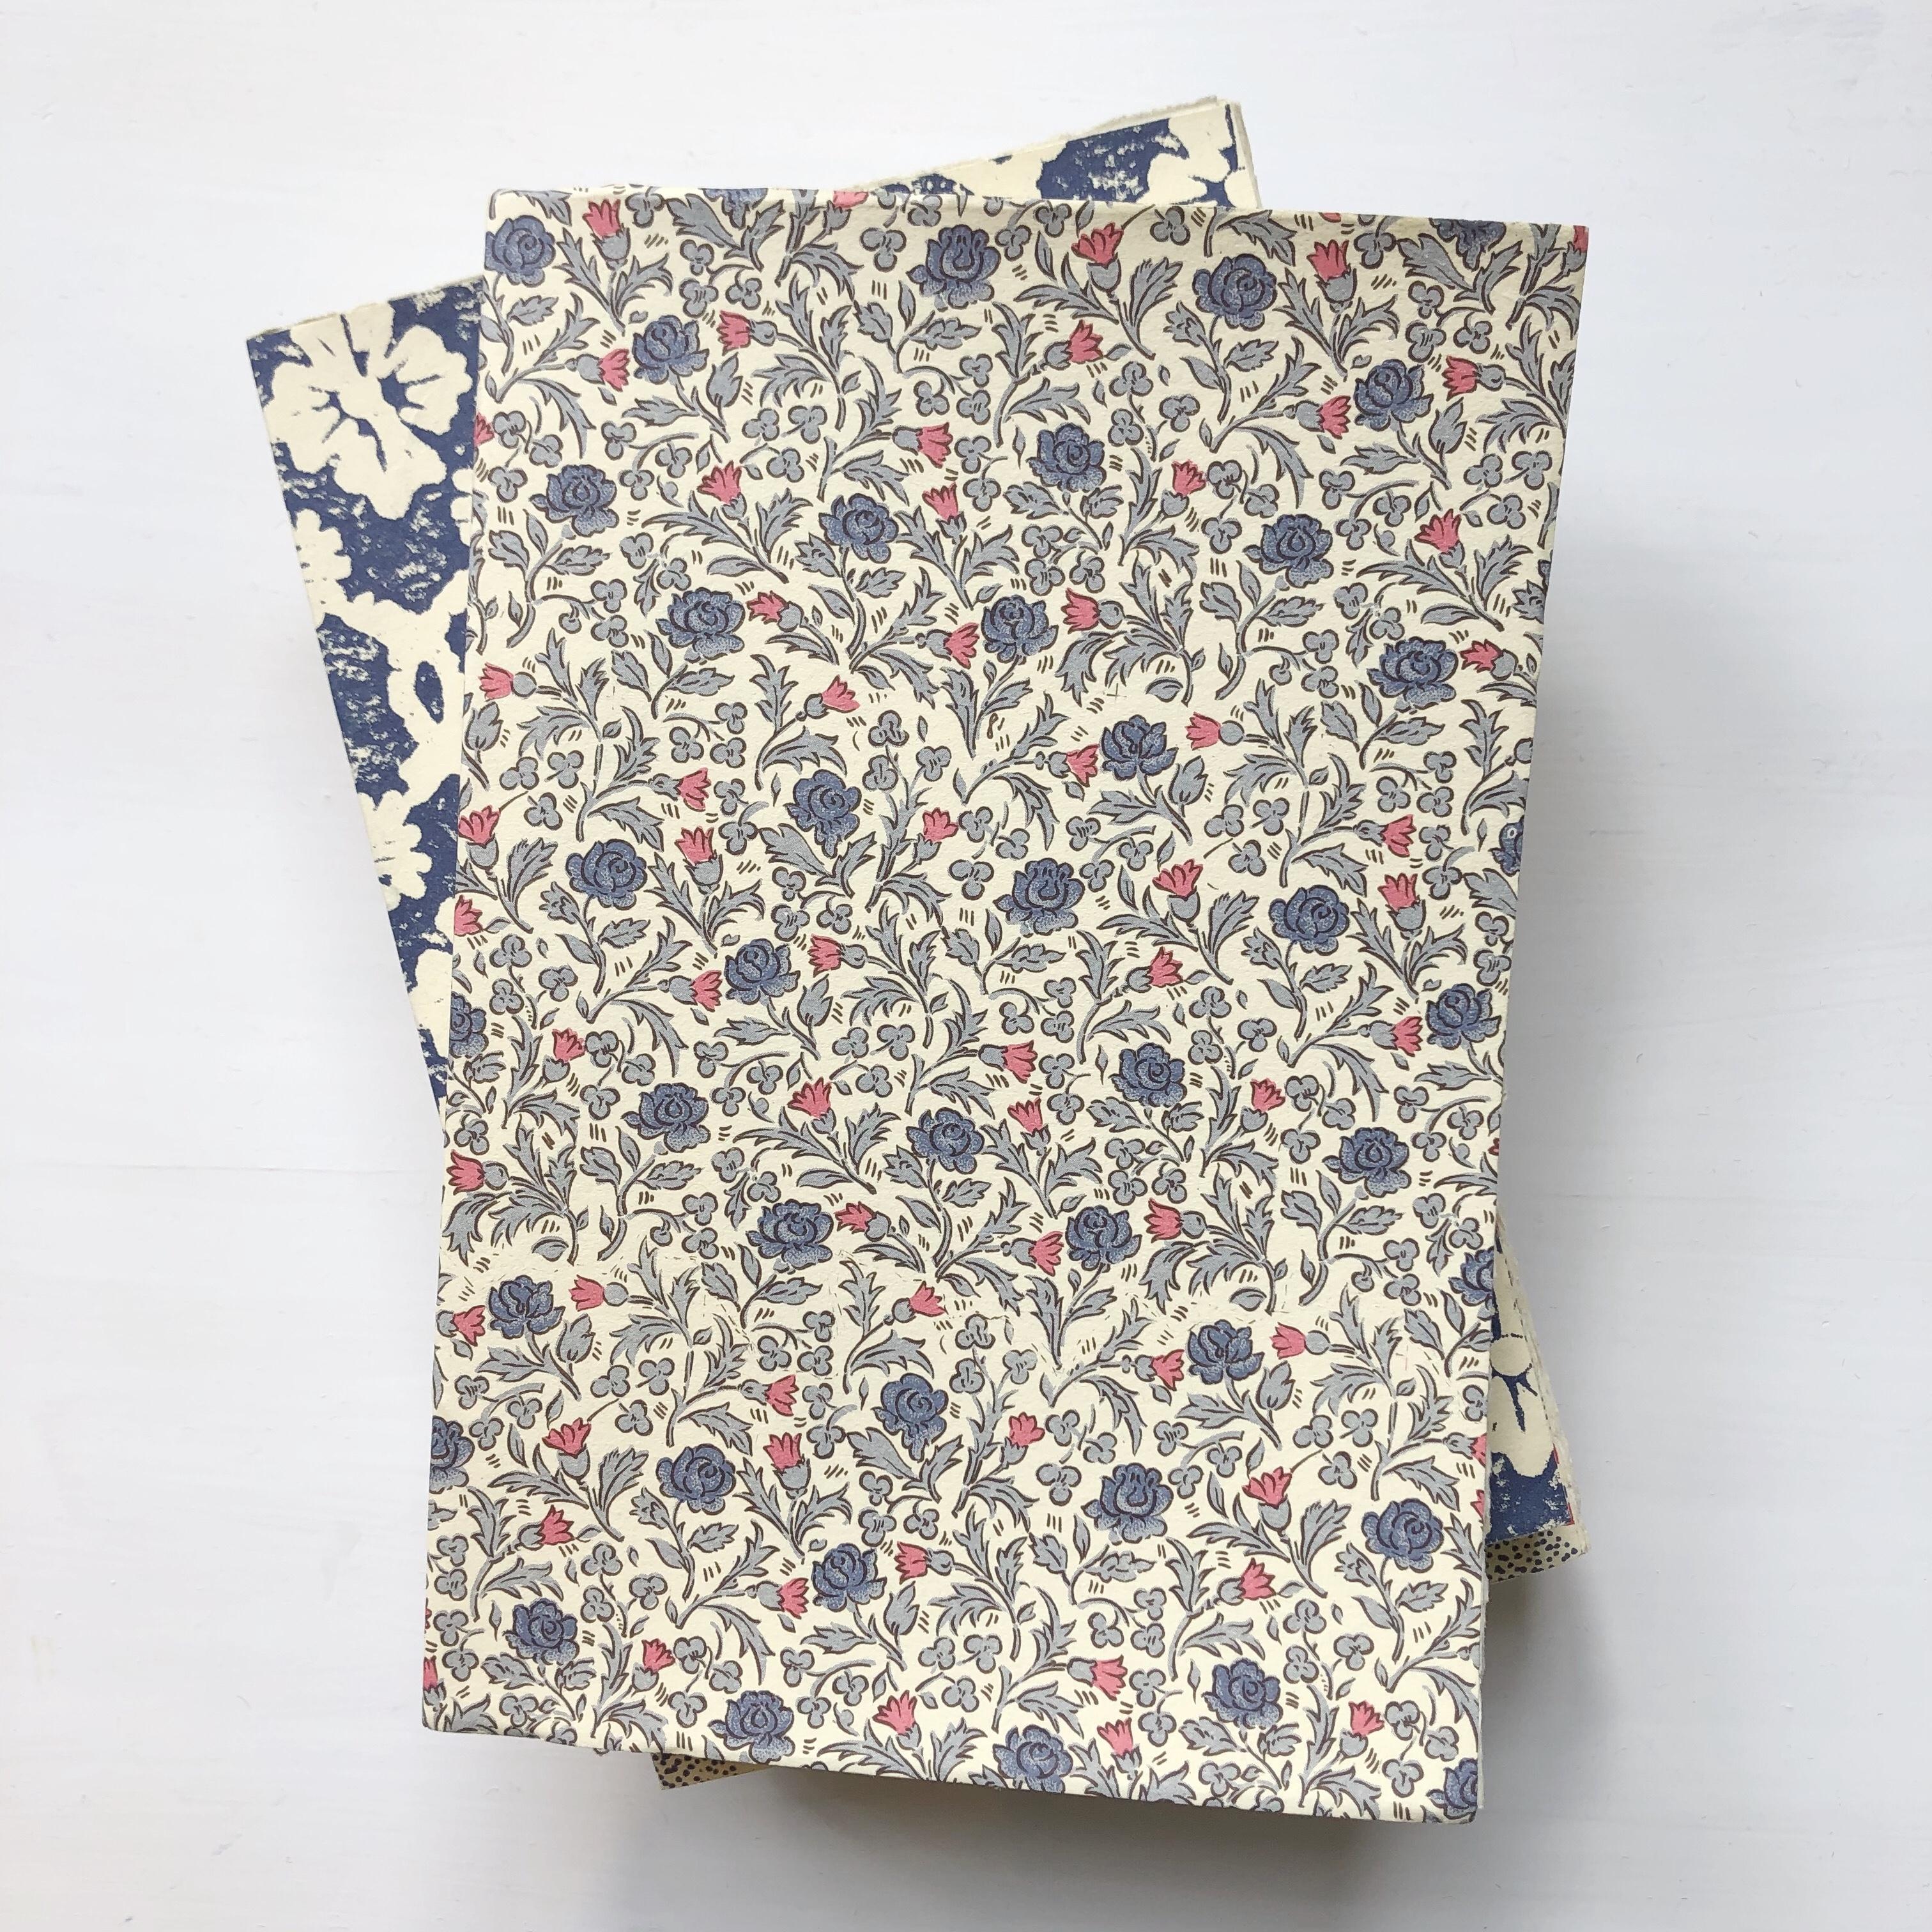 Élam Notesbog 11x16 cm